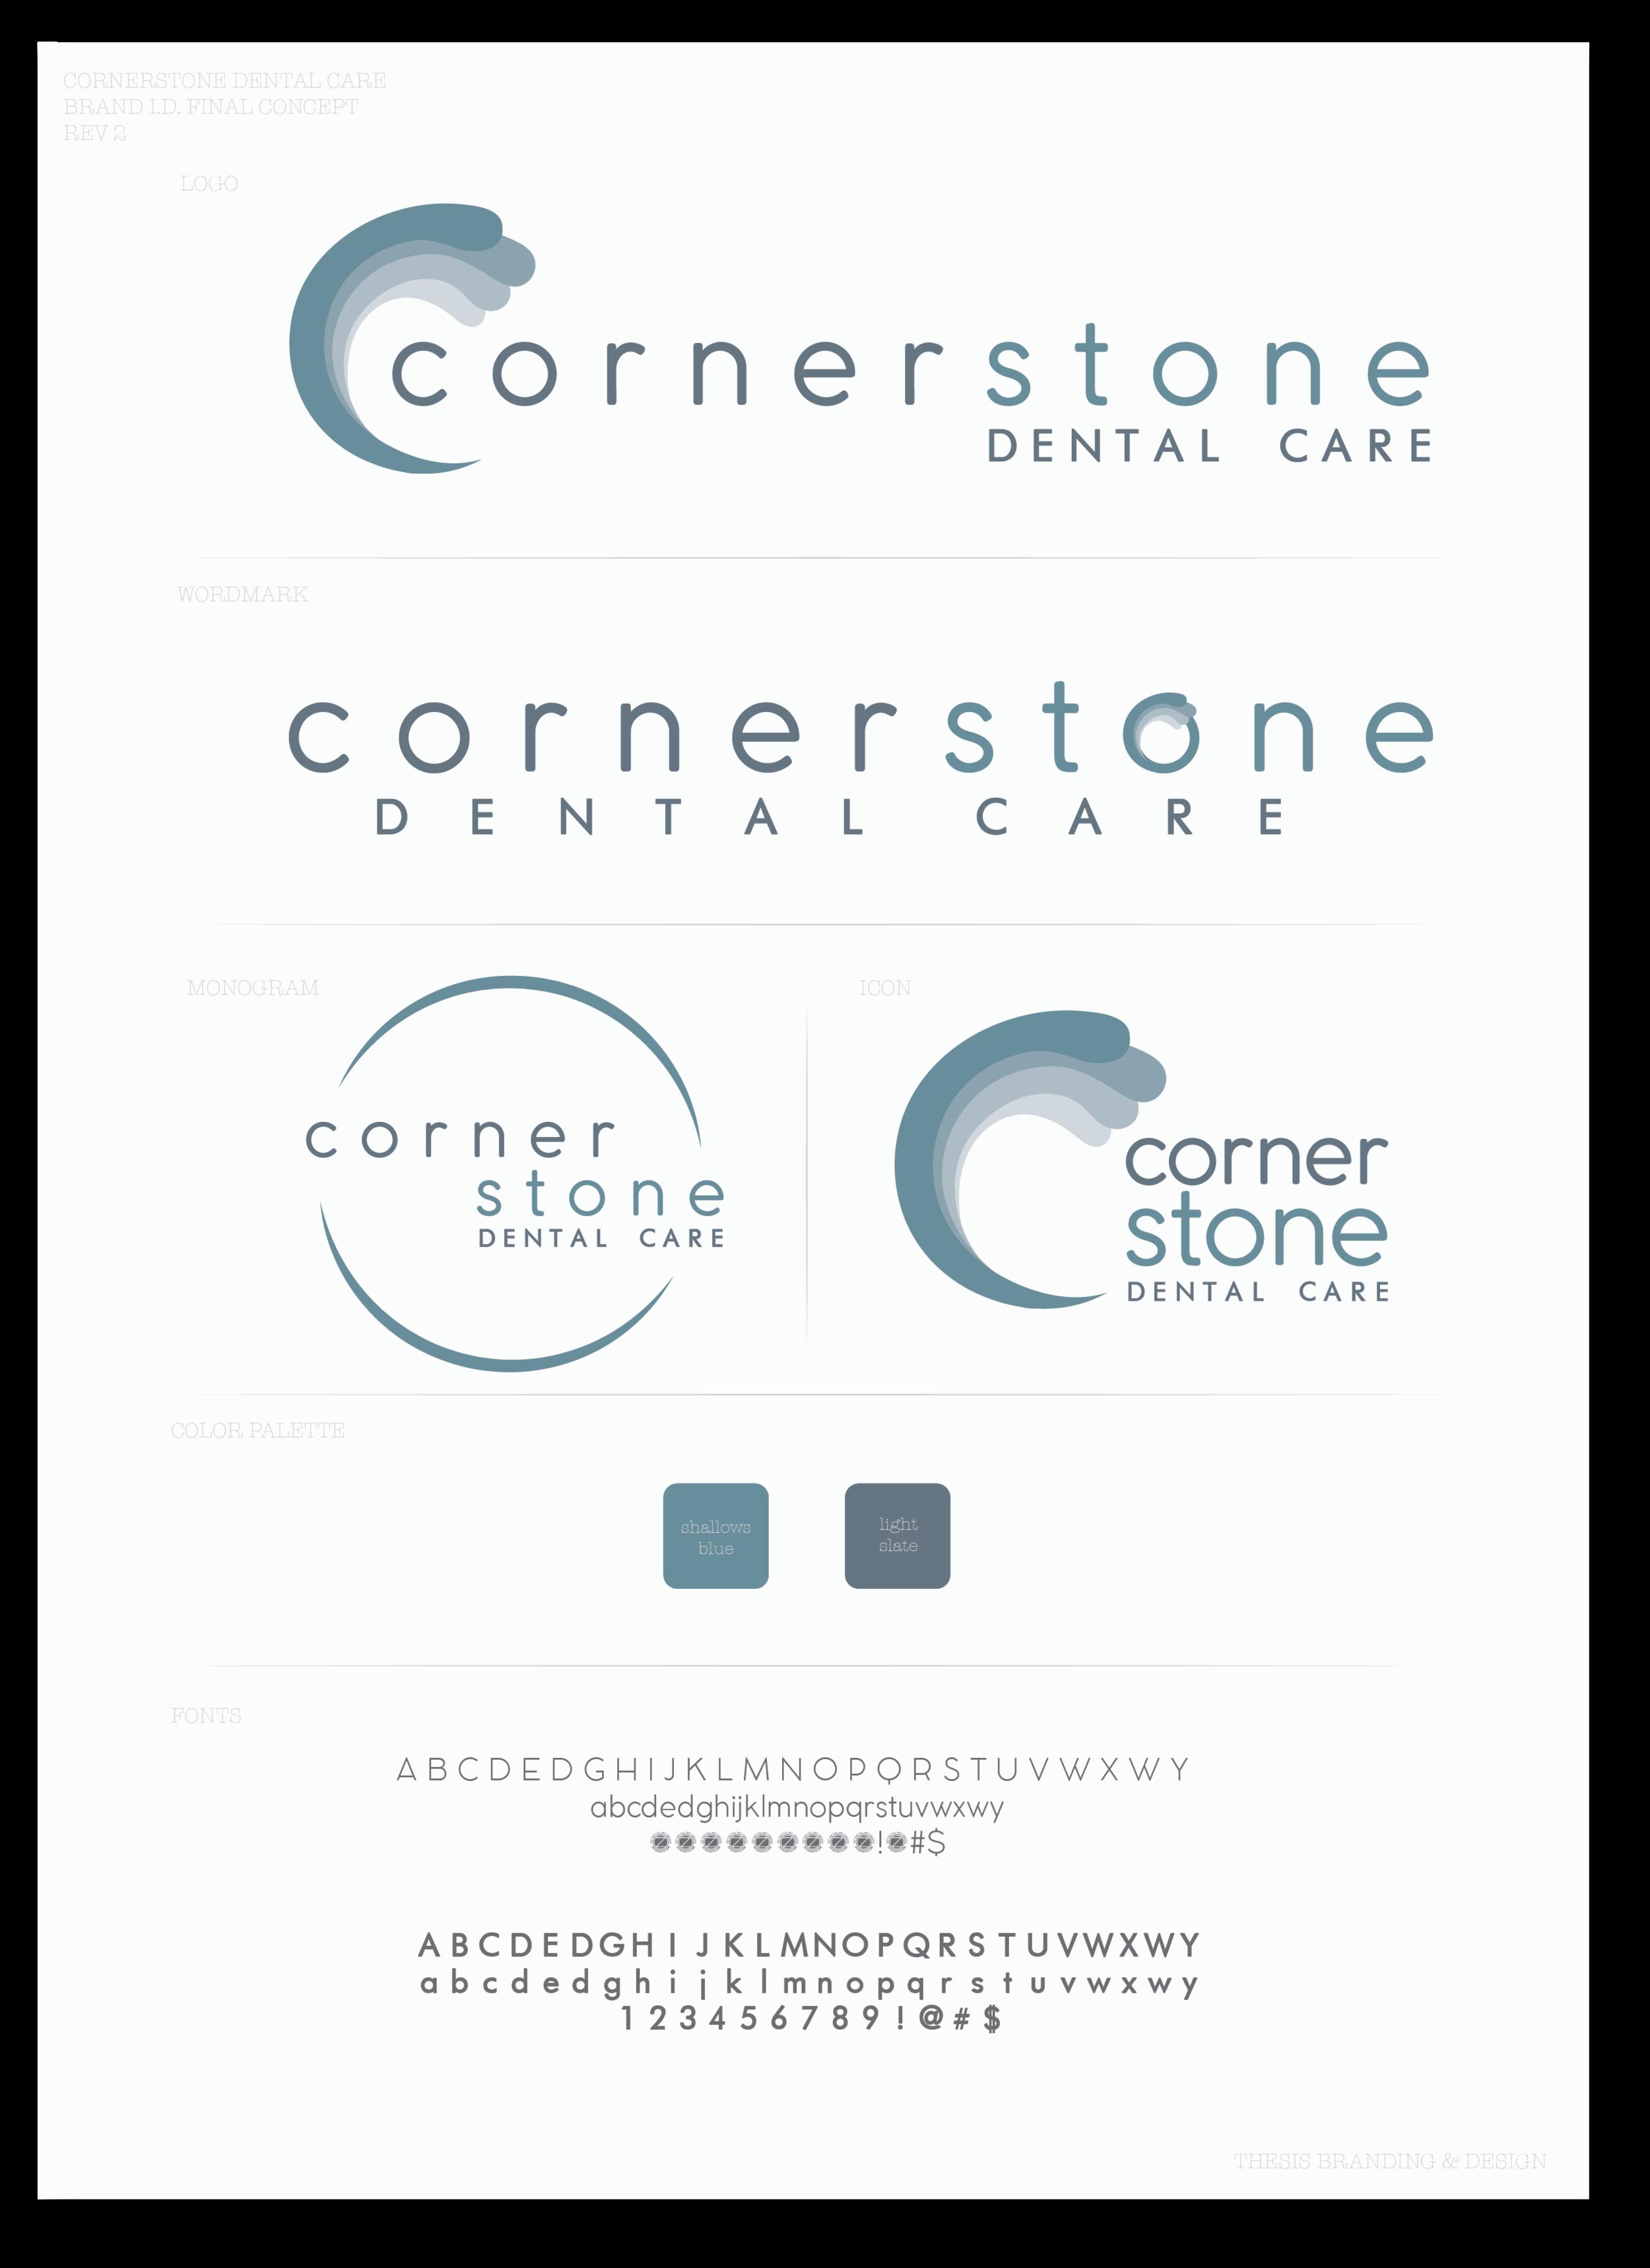 CORNERSTONE_BRAND_ID_CONCEPT_REV2-01.png